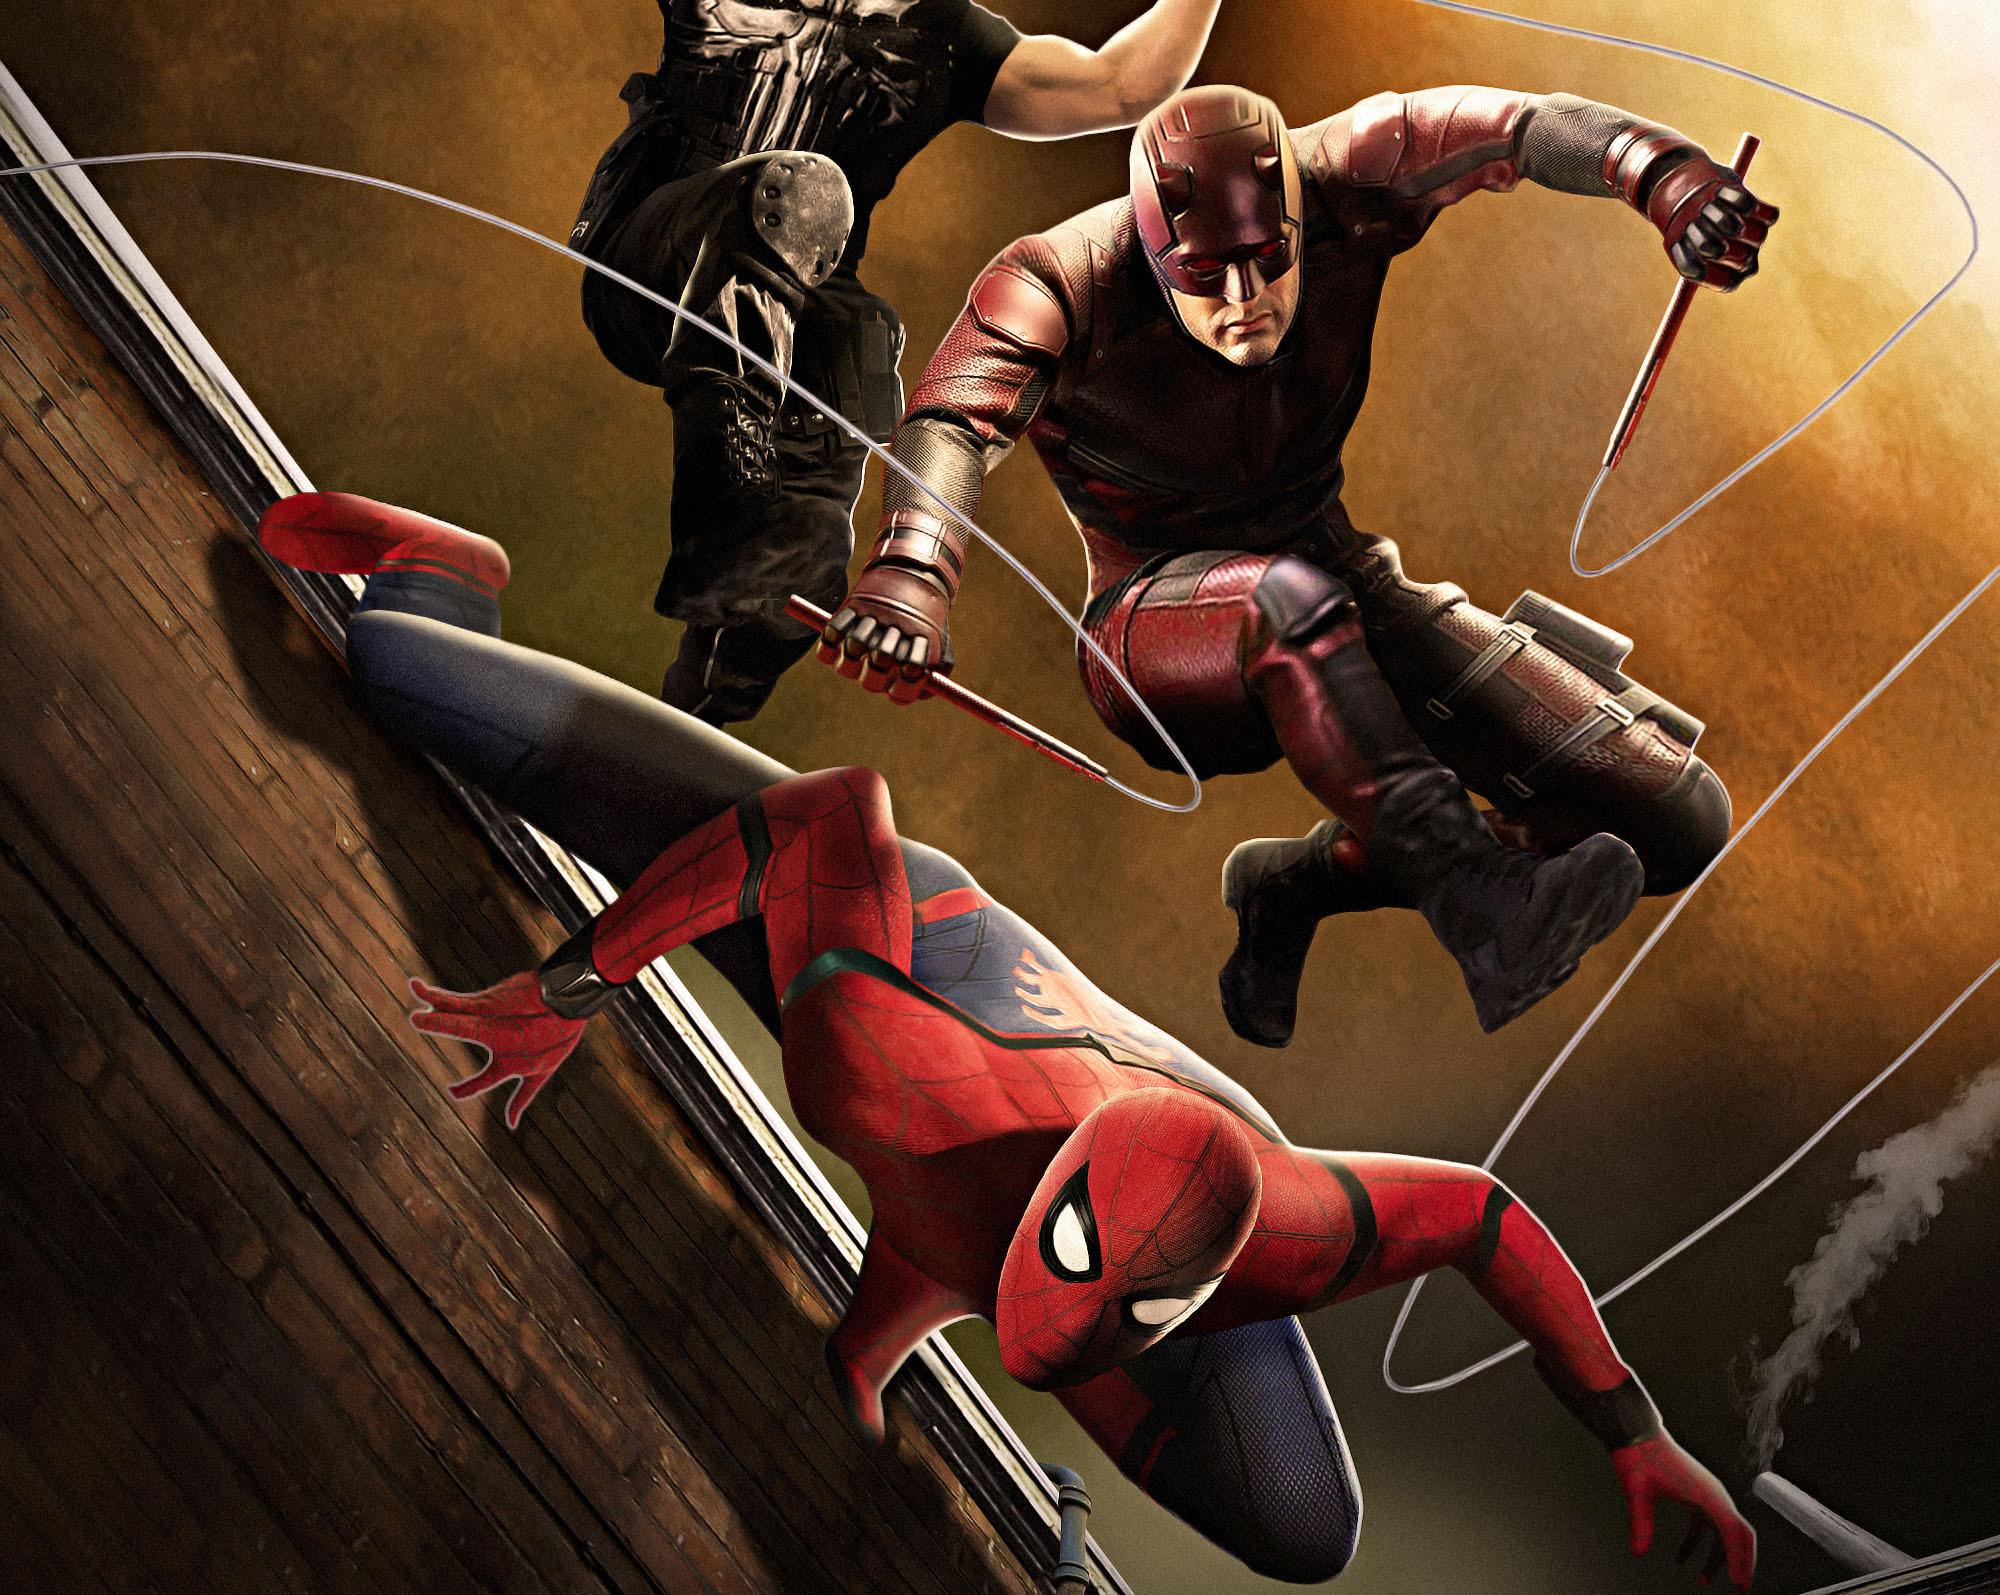 1080x1920 Daredevil Minimalism Iphone 7 6s 6 Plus Pixel: 1080x1920 Spiderman Daredevil Punisher Fan Art Iphone 7,6s